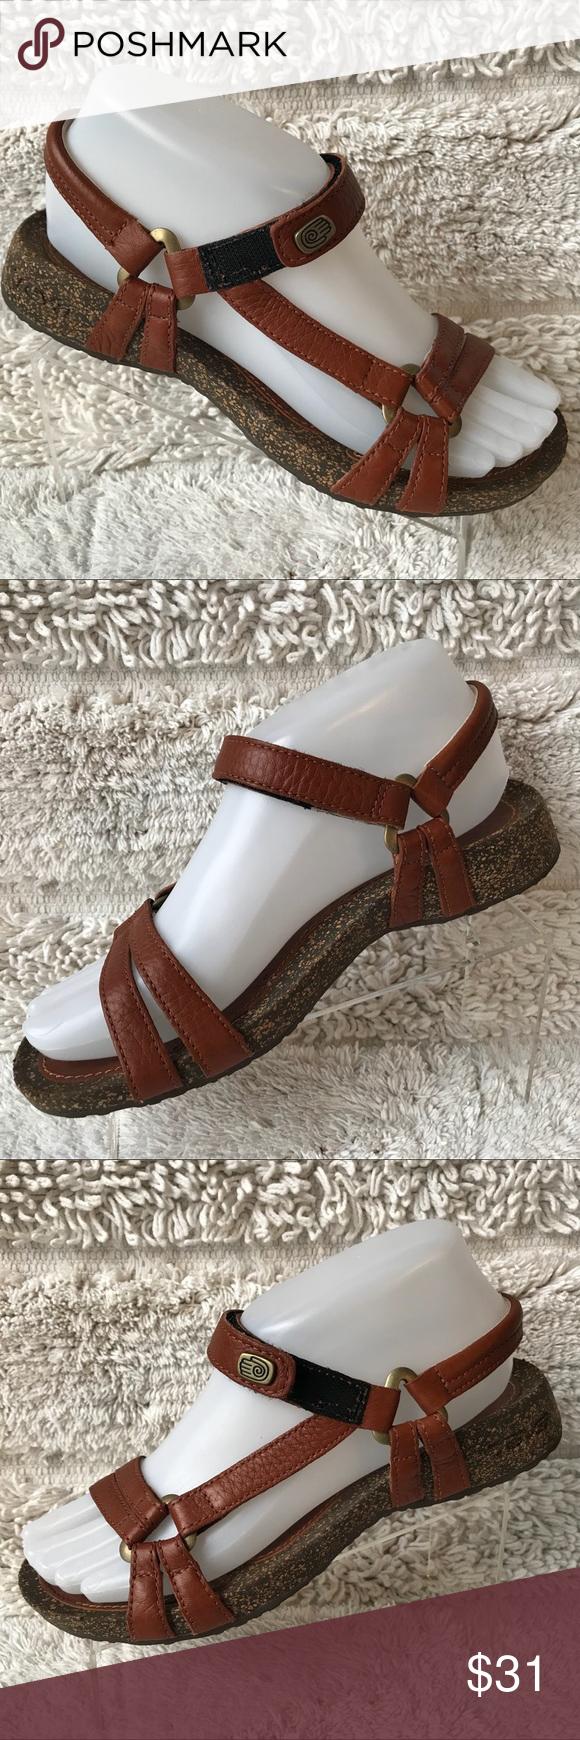 db15aa35f Strappy adjustable cork wedge sandals comply TEVA Ventura 6510 brown Cork  Adjustable Strappy Sandals Shoes Womens US S 6 EU37 Teva Shoes Sandals